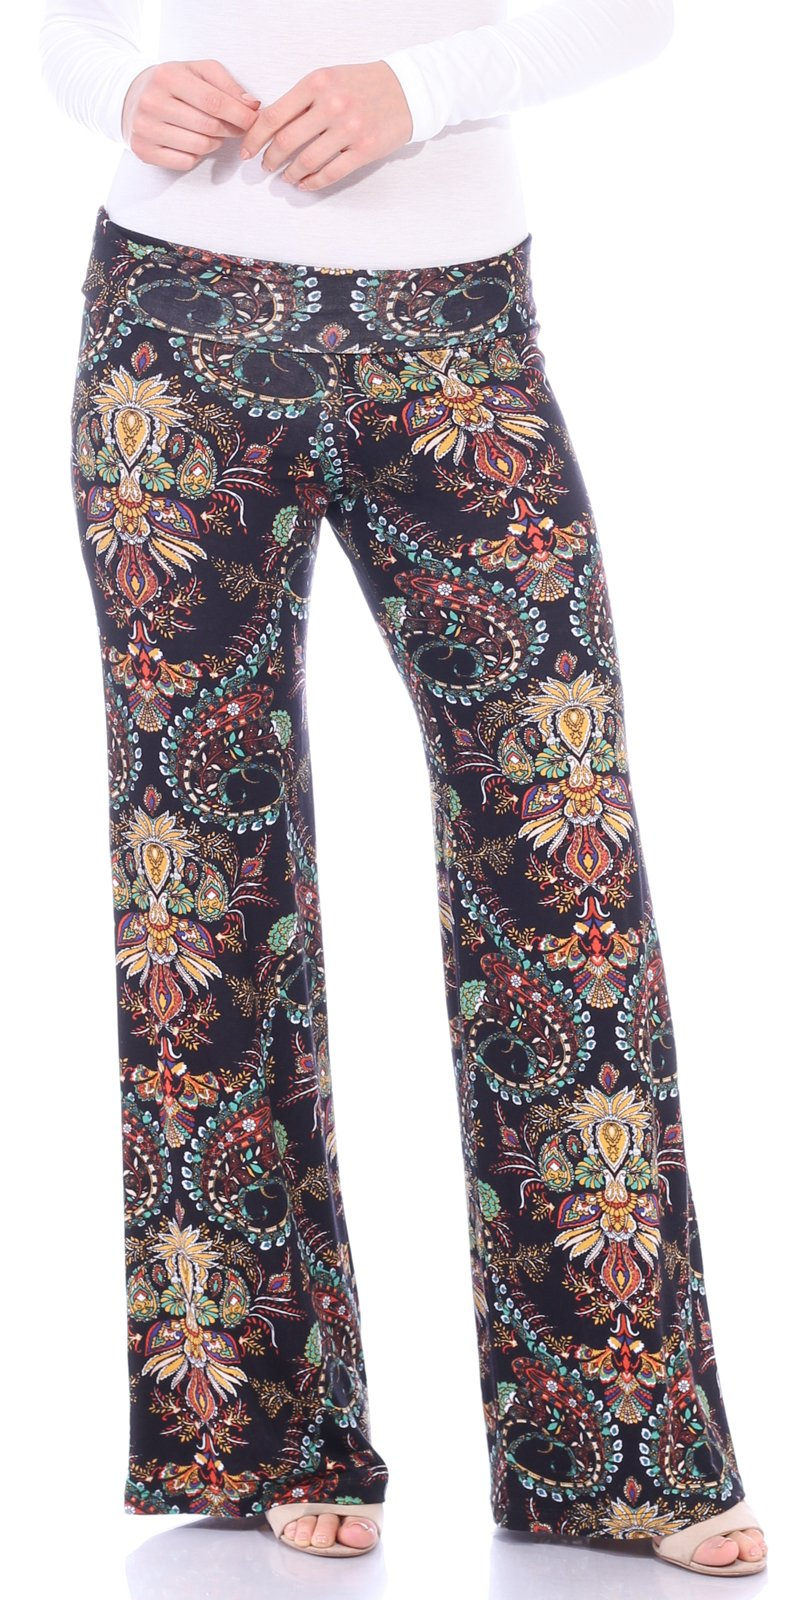 Popana Women's Casual Wide Leg Boho Flare Floral Print Palazzo Pants Made In USA X-Large ST02 Boho Paisley